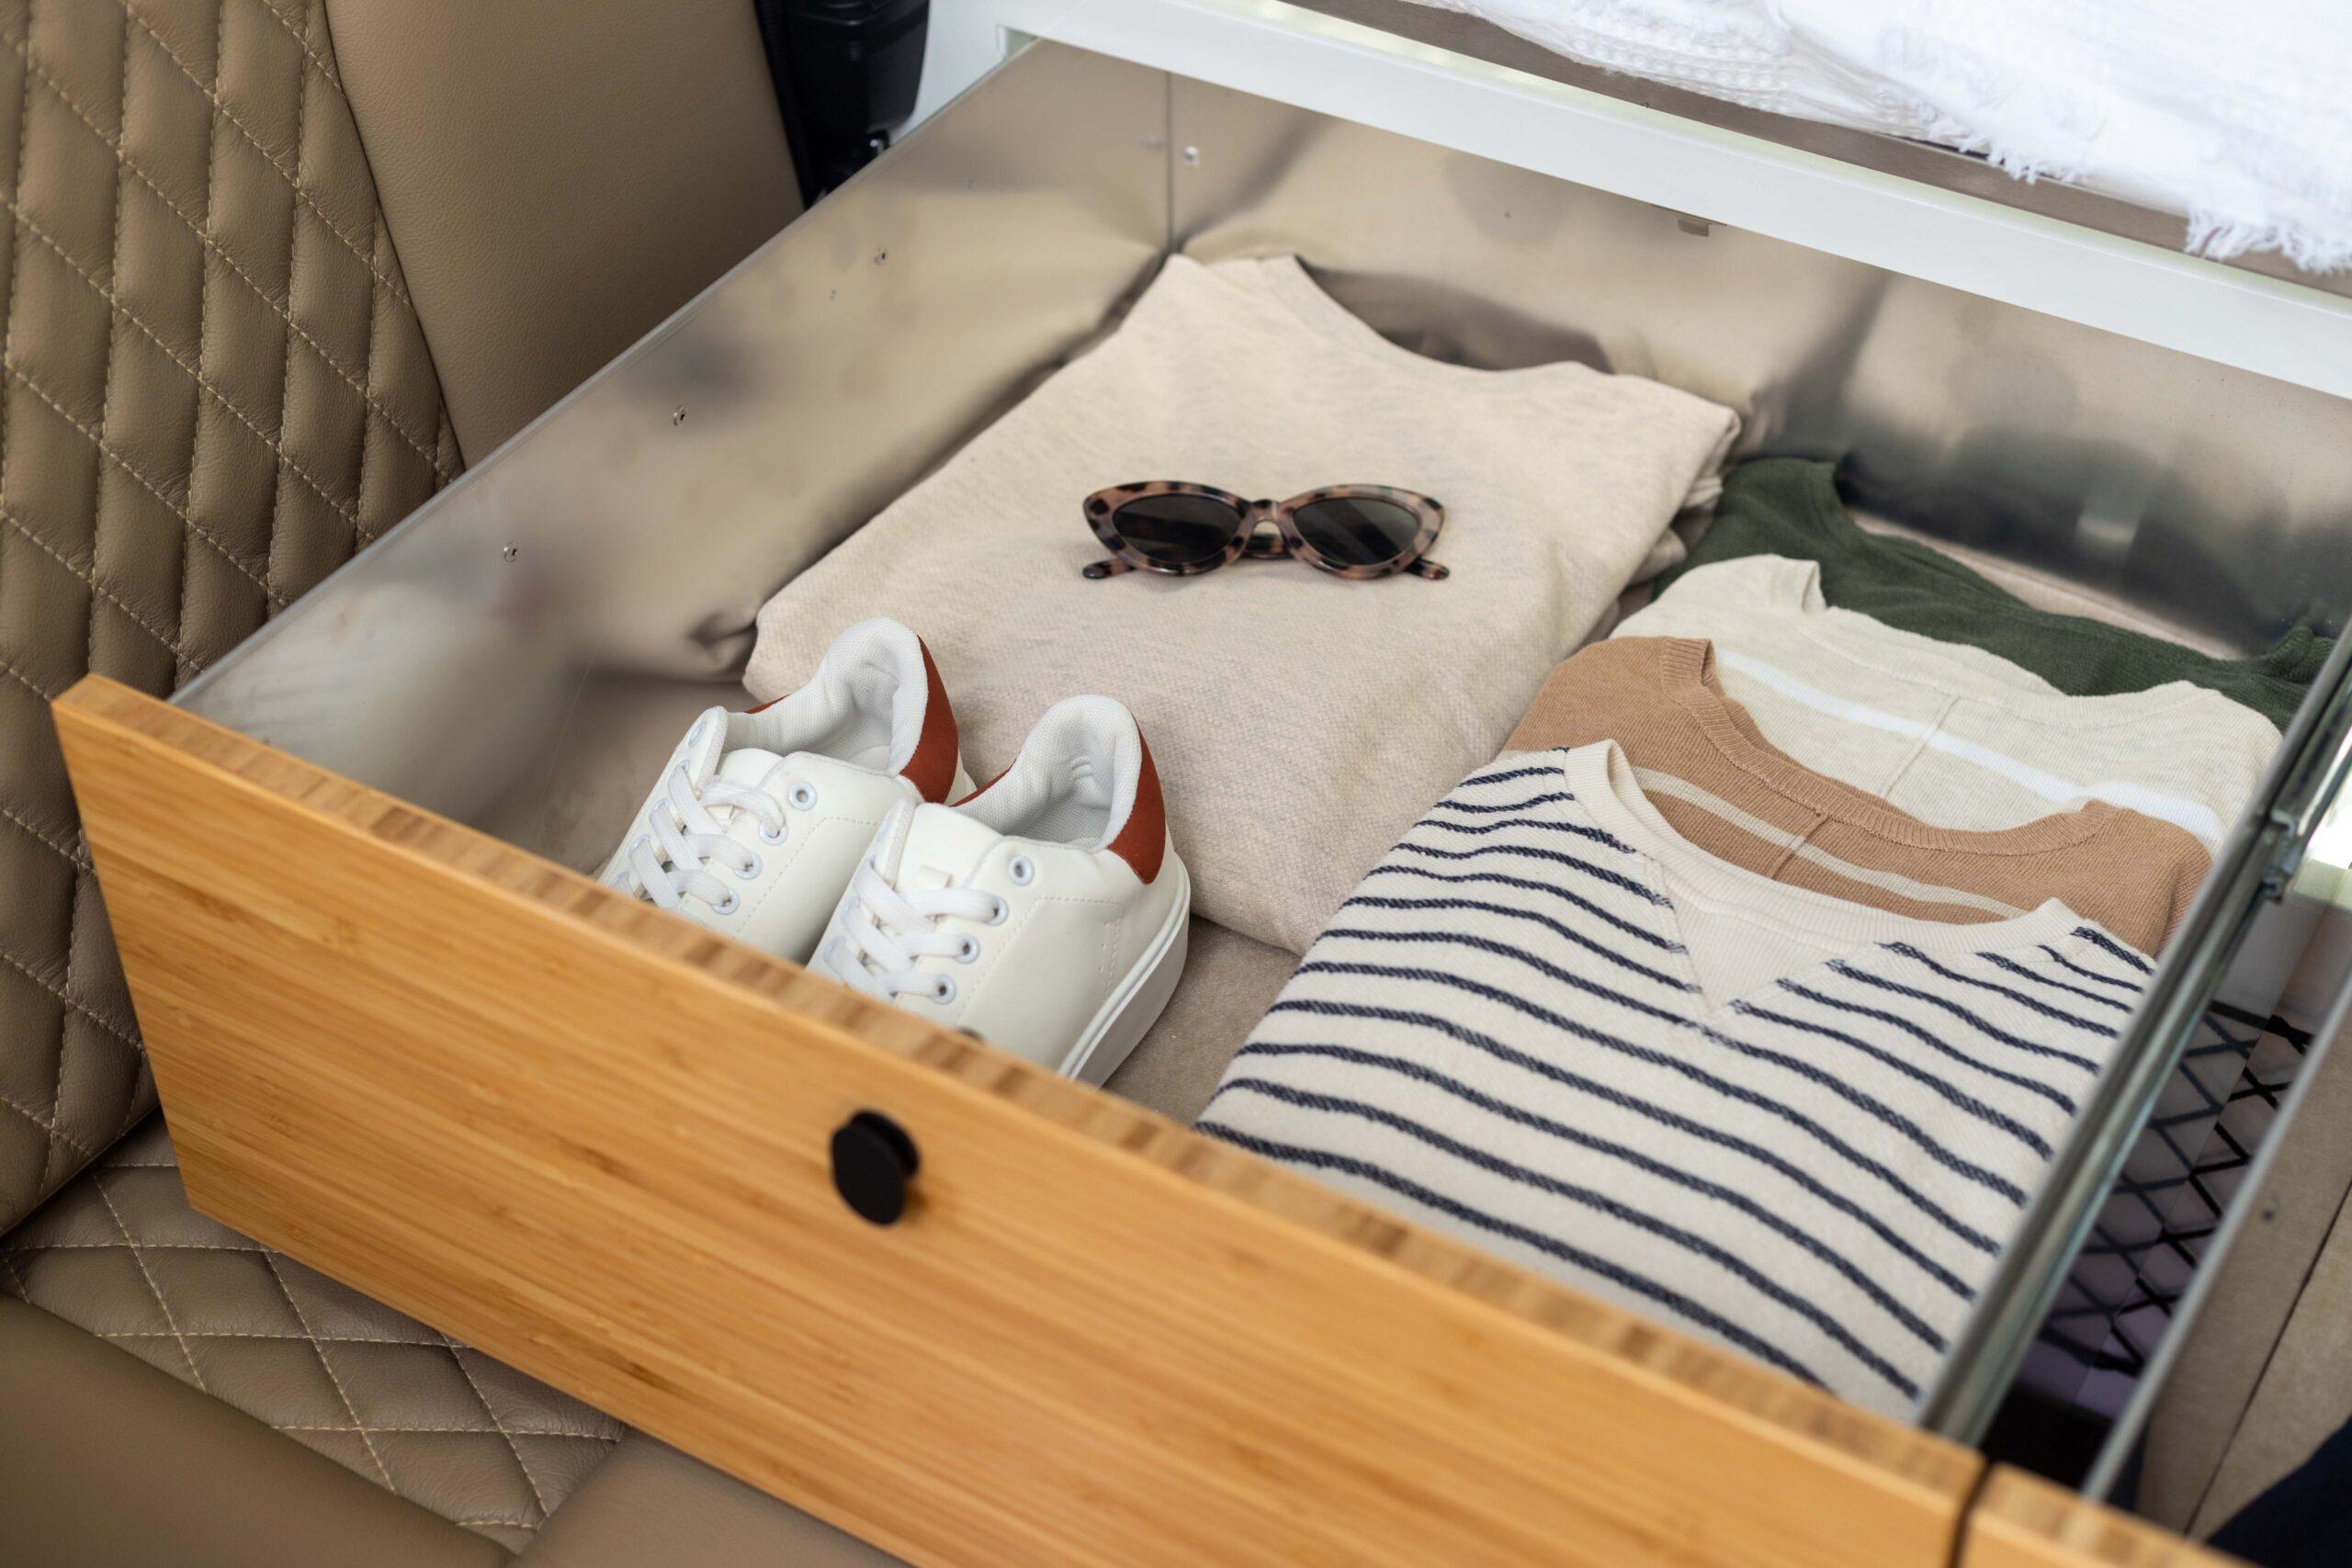 Kimberley Karavan under bed storage-3